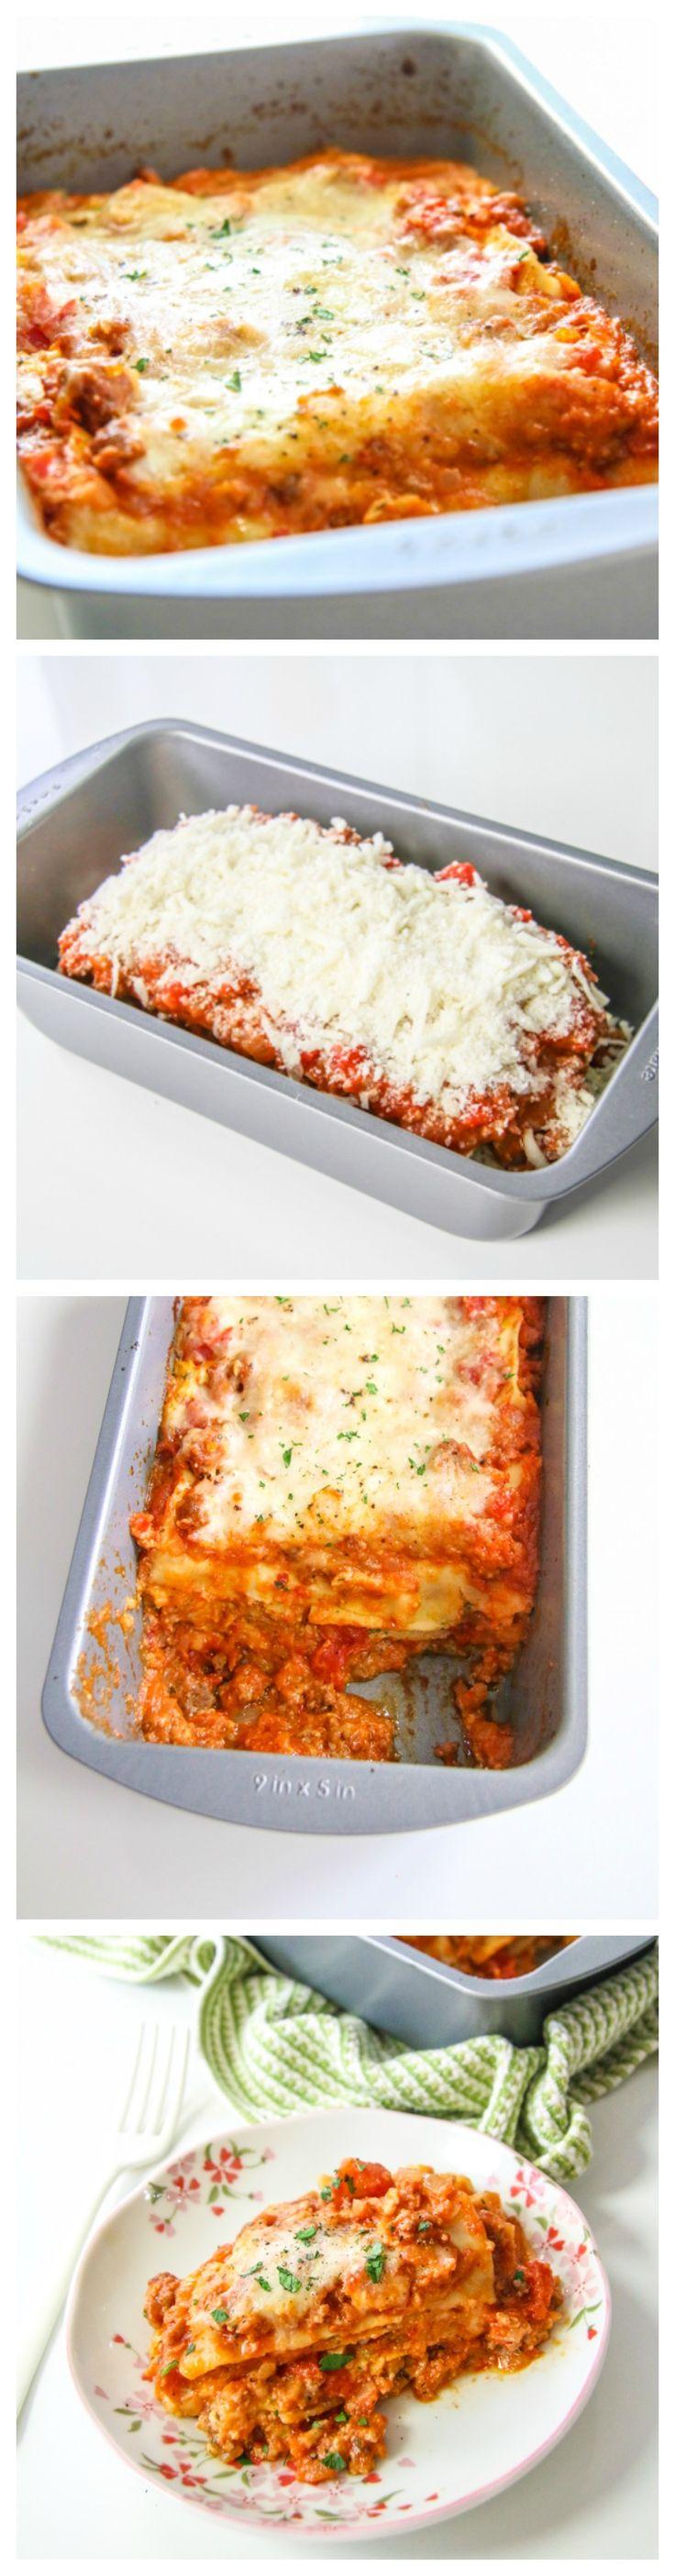 Multiple Lasagna Pictures